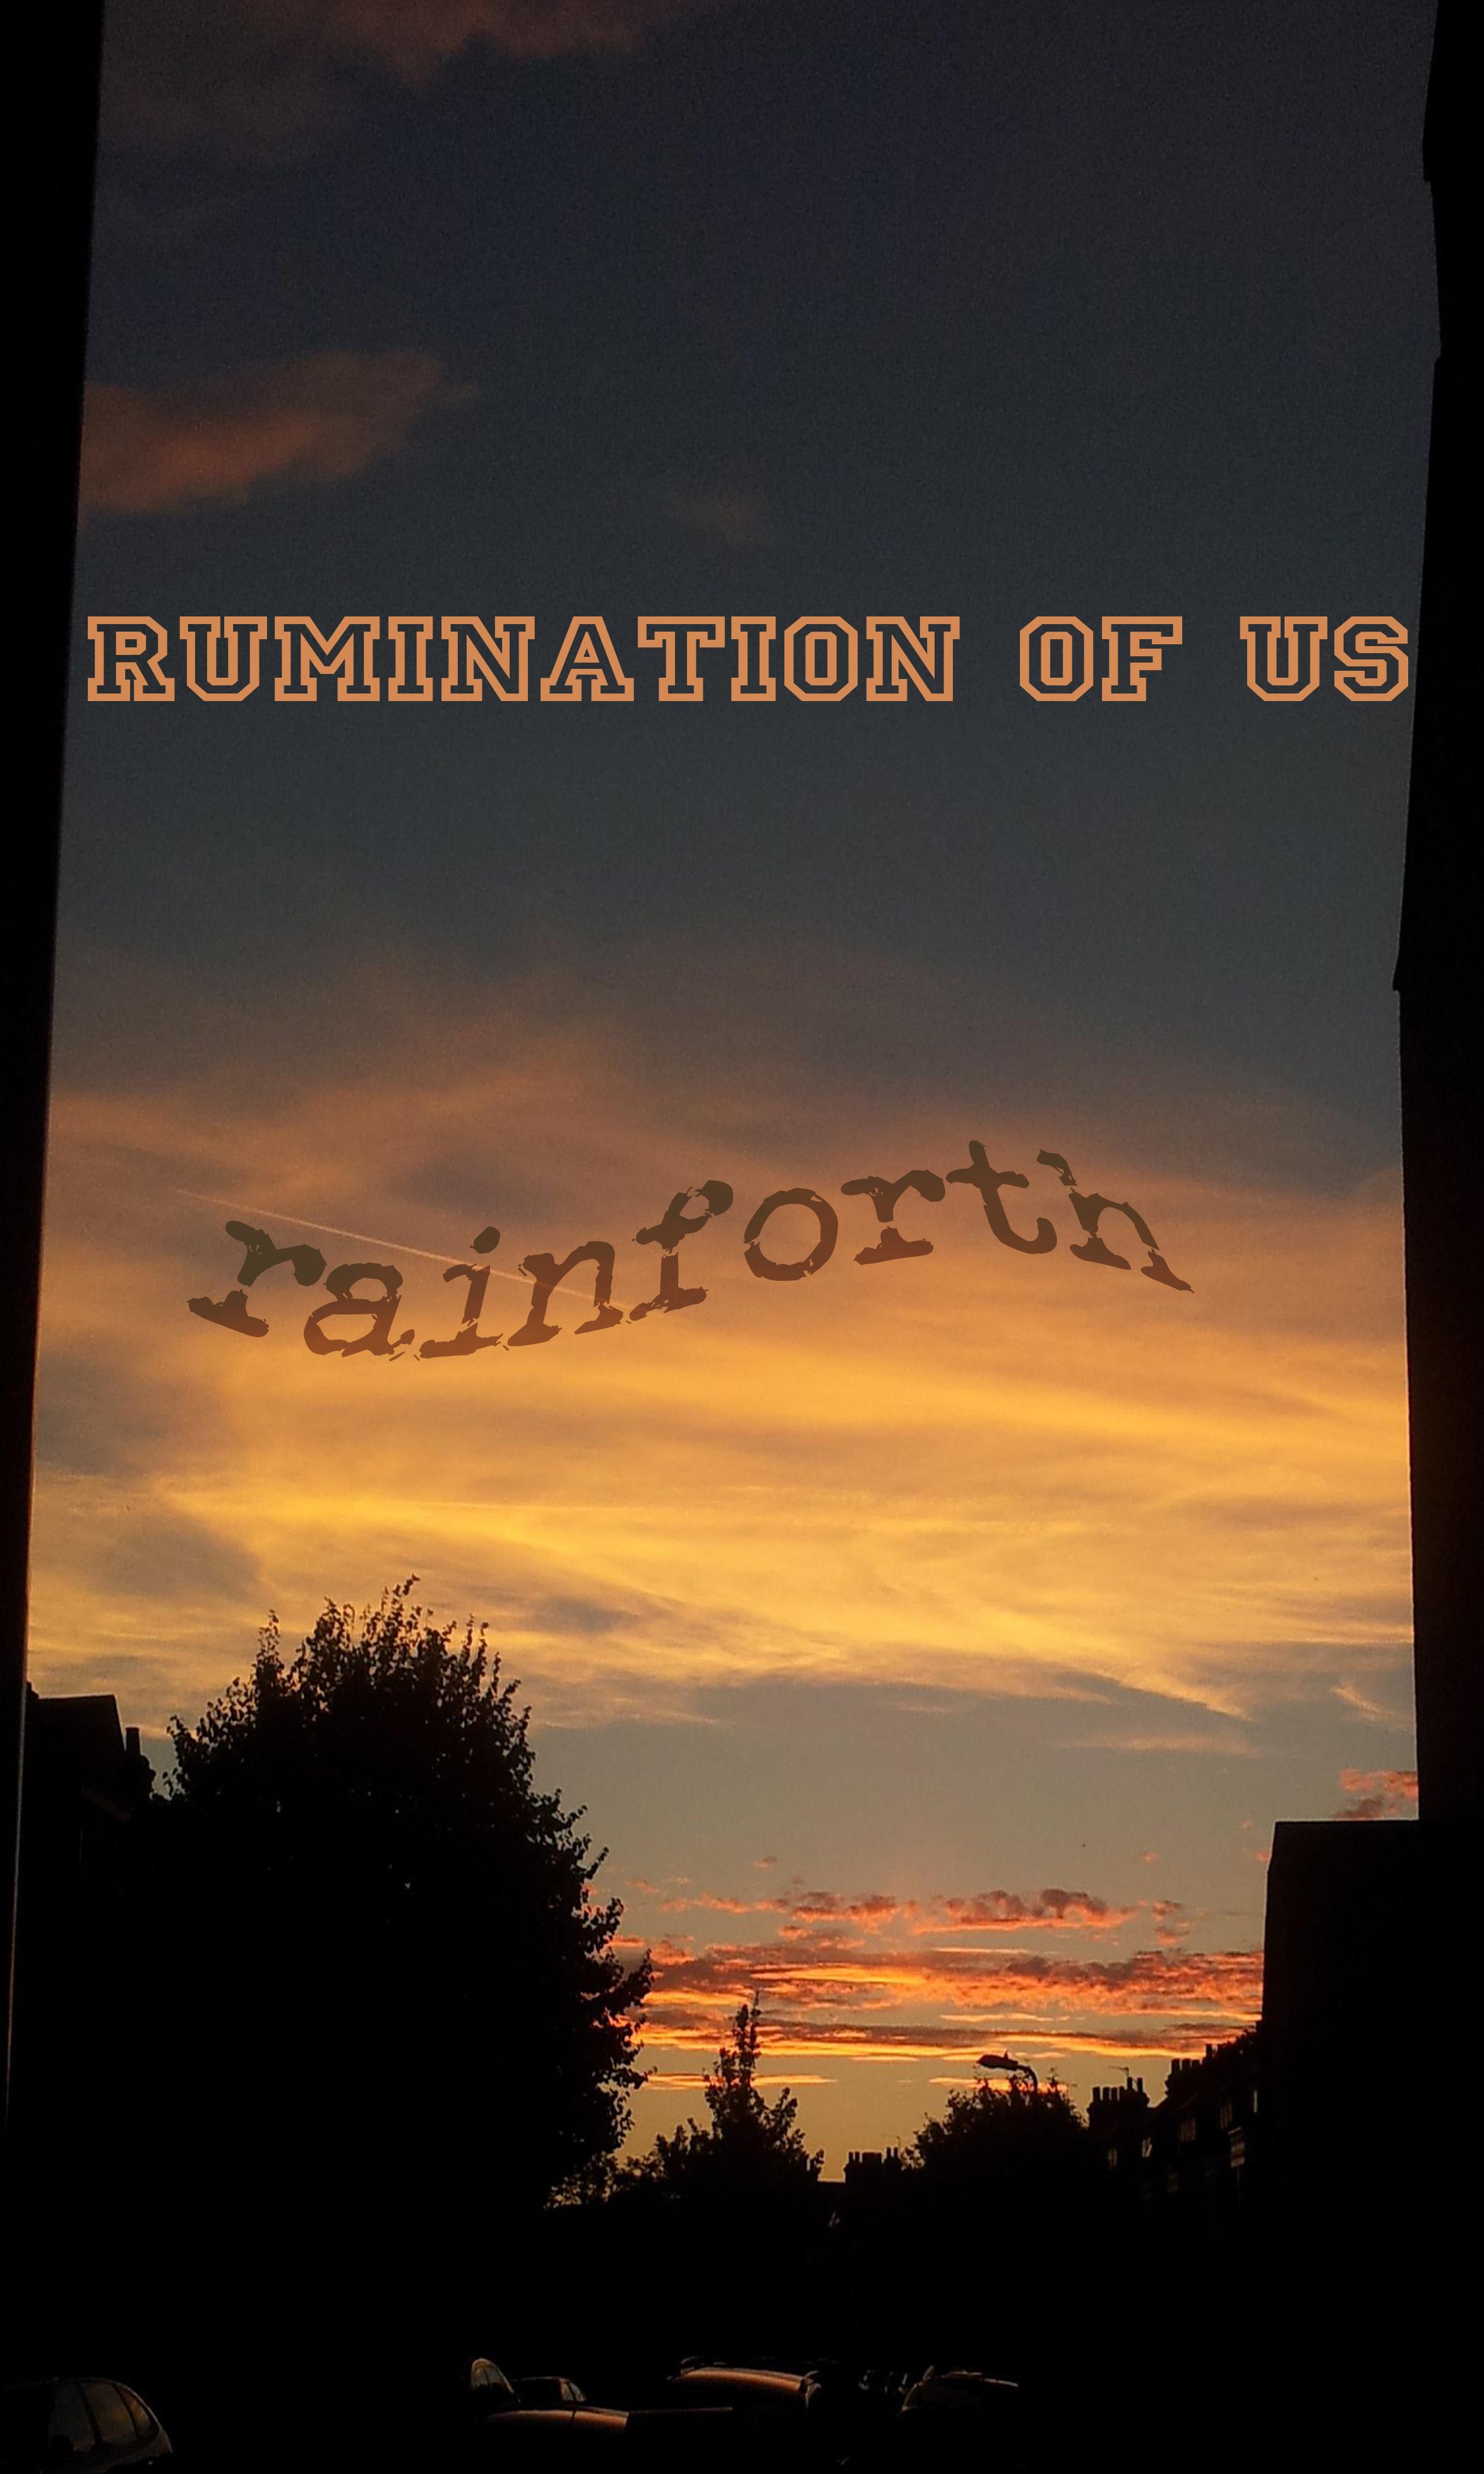 Rumination of Us - Rainforth